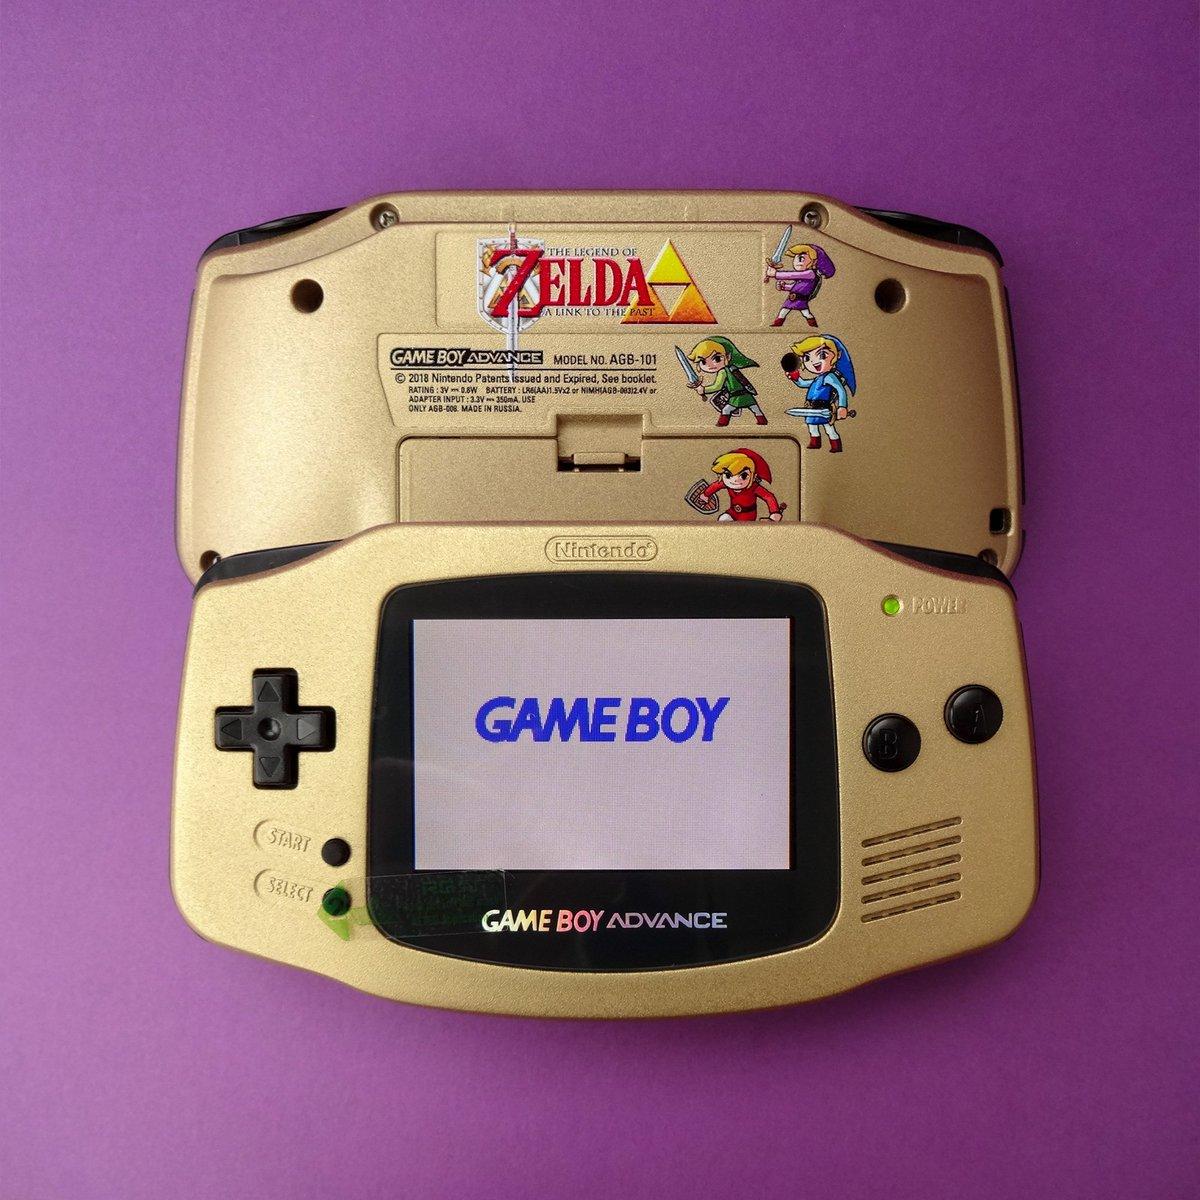 GameBoy Kingdom على تويتر: